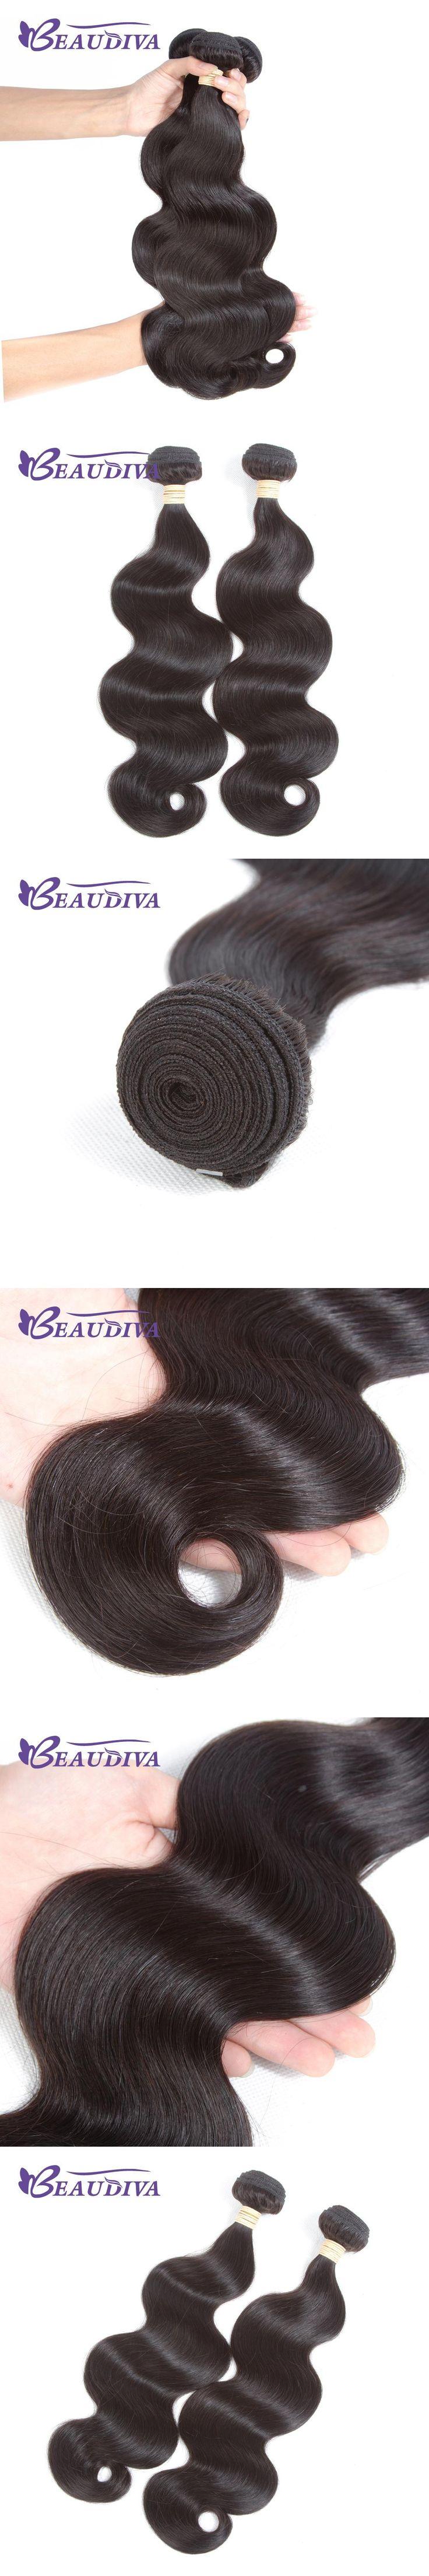 Beau Diva Hair Brazilian Body Wave Hair Weave Bundles 2PCS  100% Human Hair Bundles Remy Natural Color